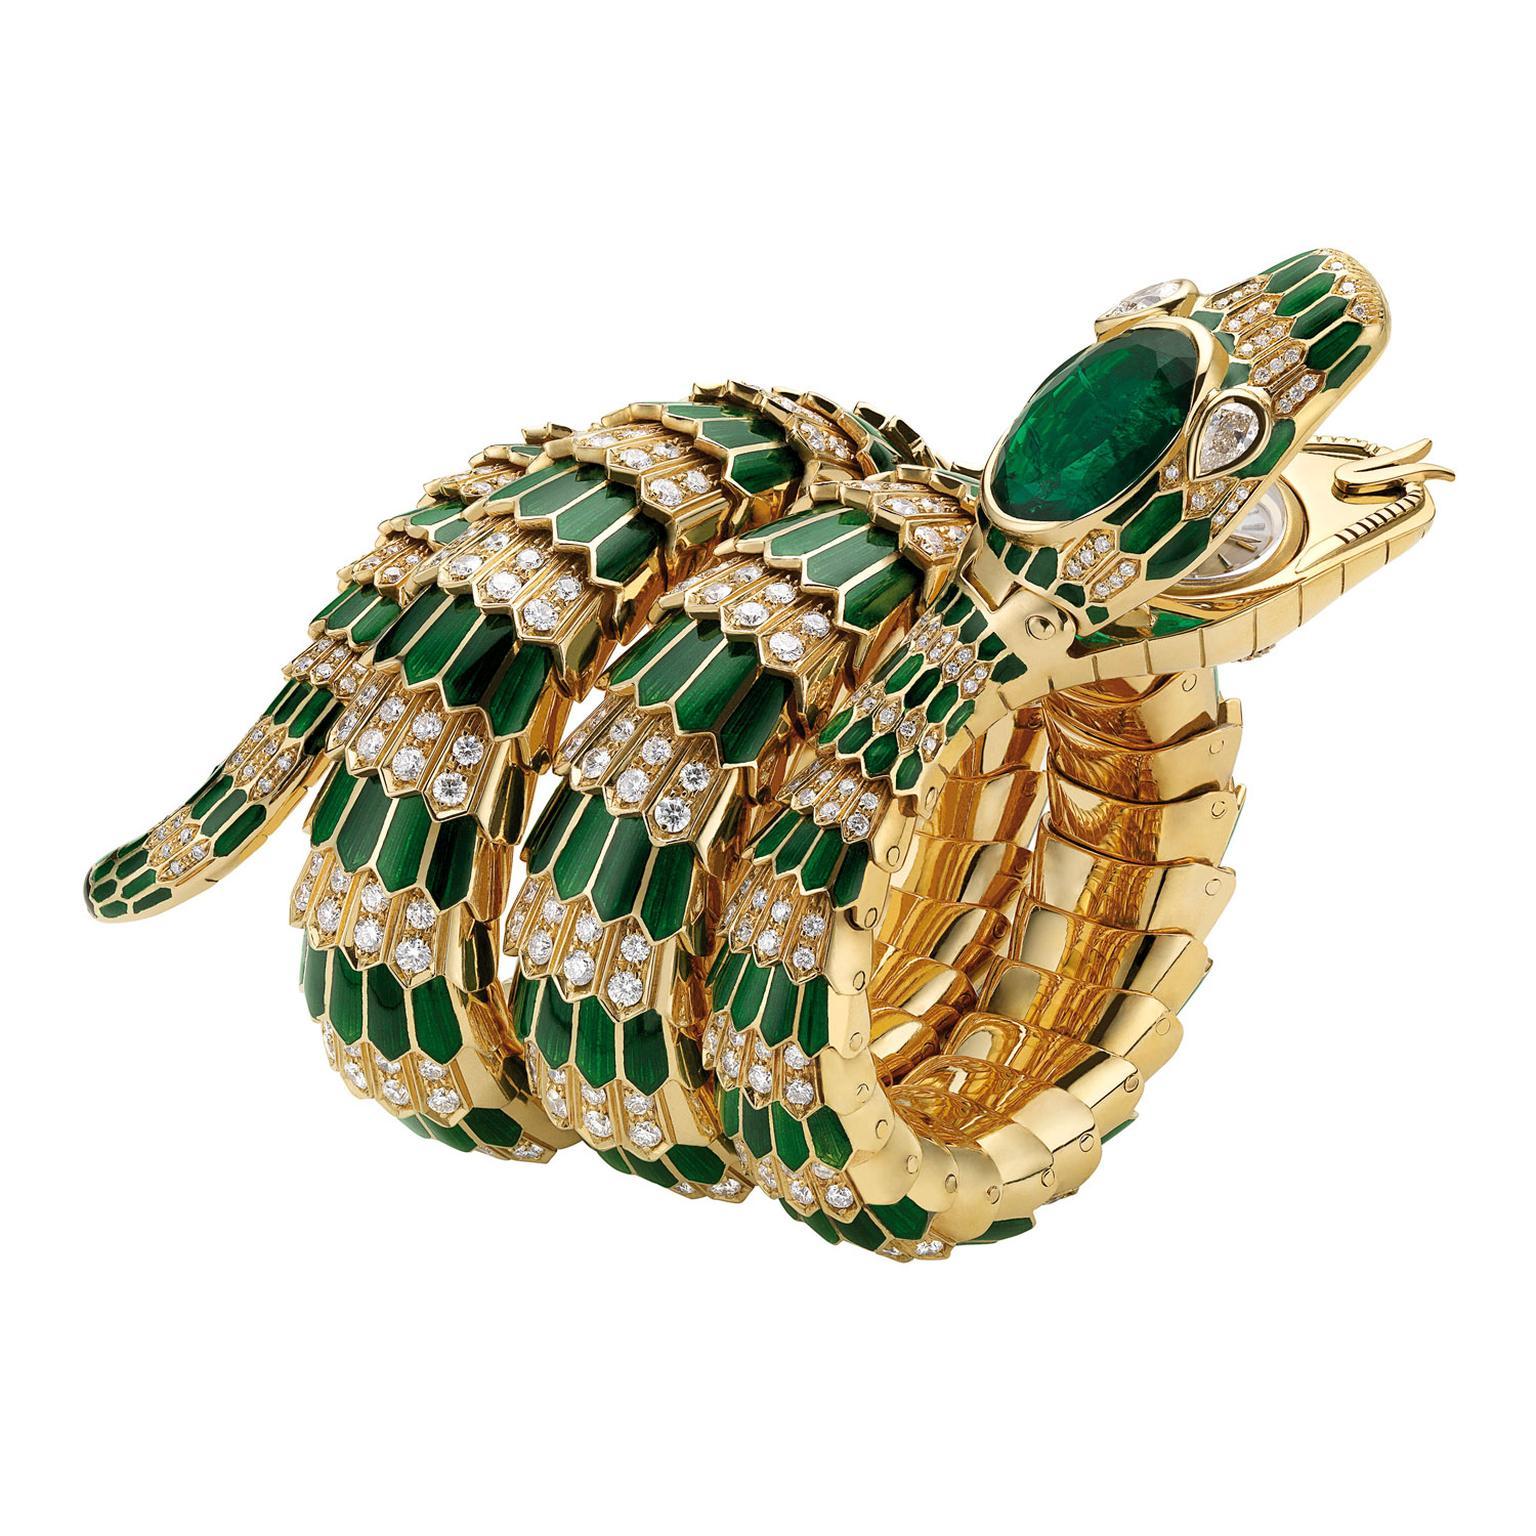 bulgari_serpenti-example_exhi039541.jpg__1536x0_q75_crop-scale_subsampling-2_upscale-false the jewellery editor.jpg